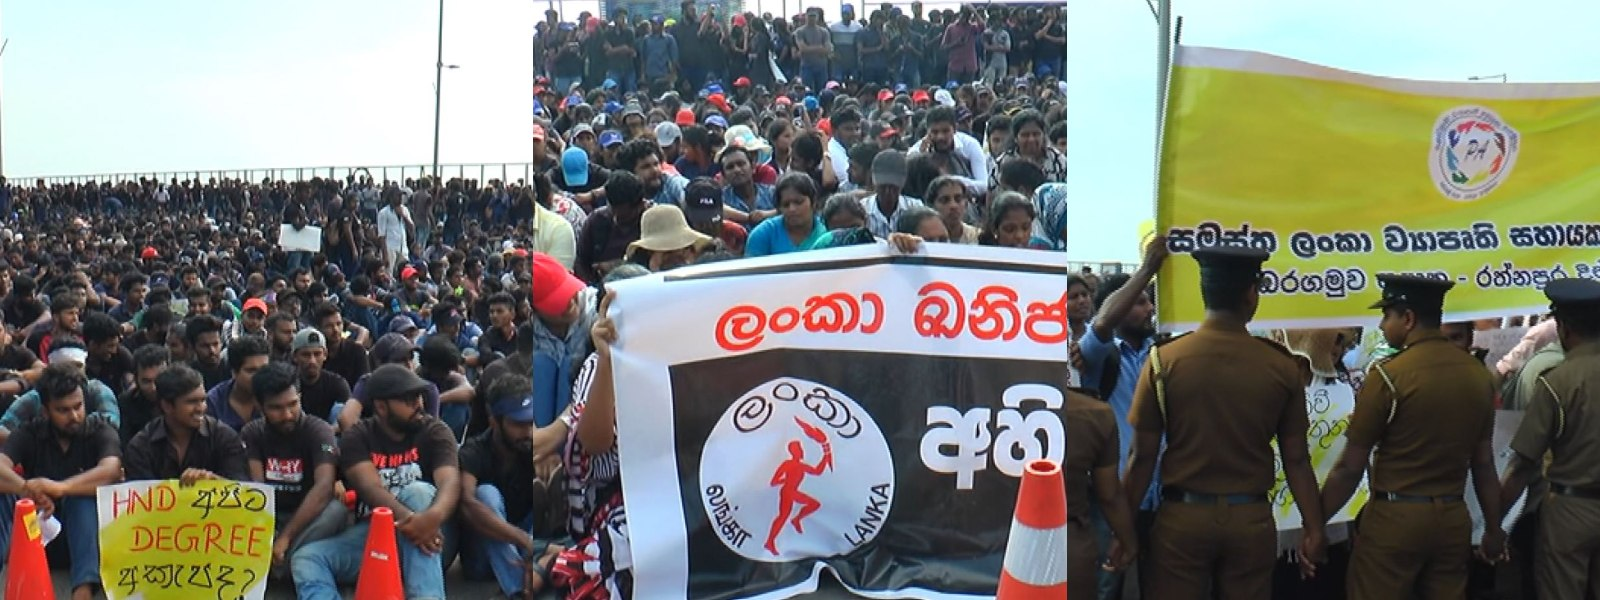 3 protests cause heavy traffic congestion near Presidential Secretariat